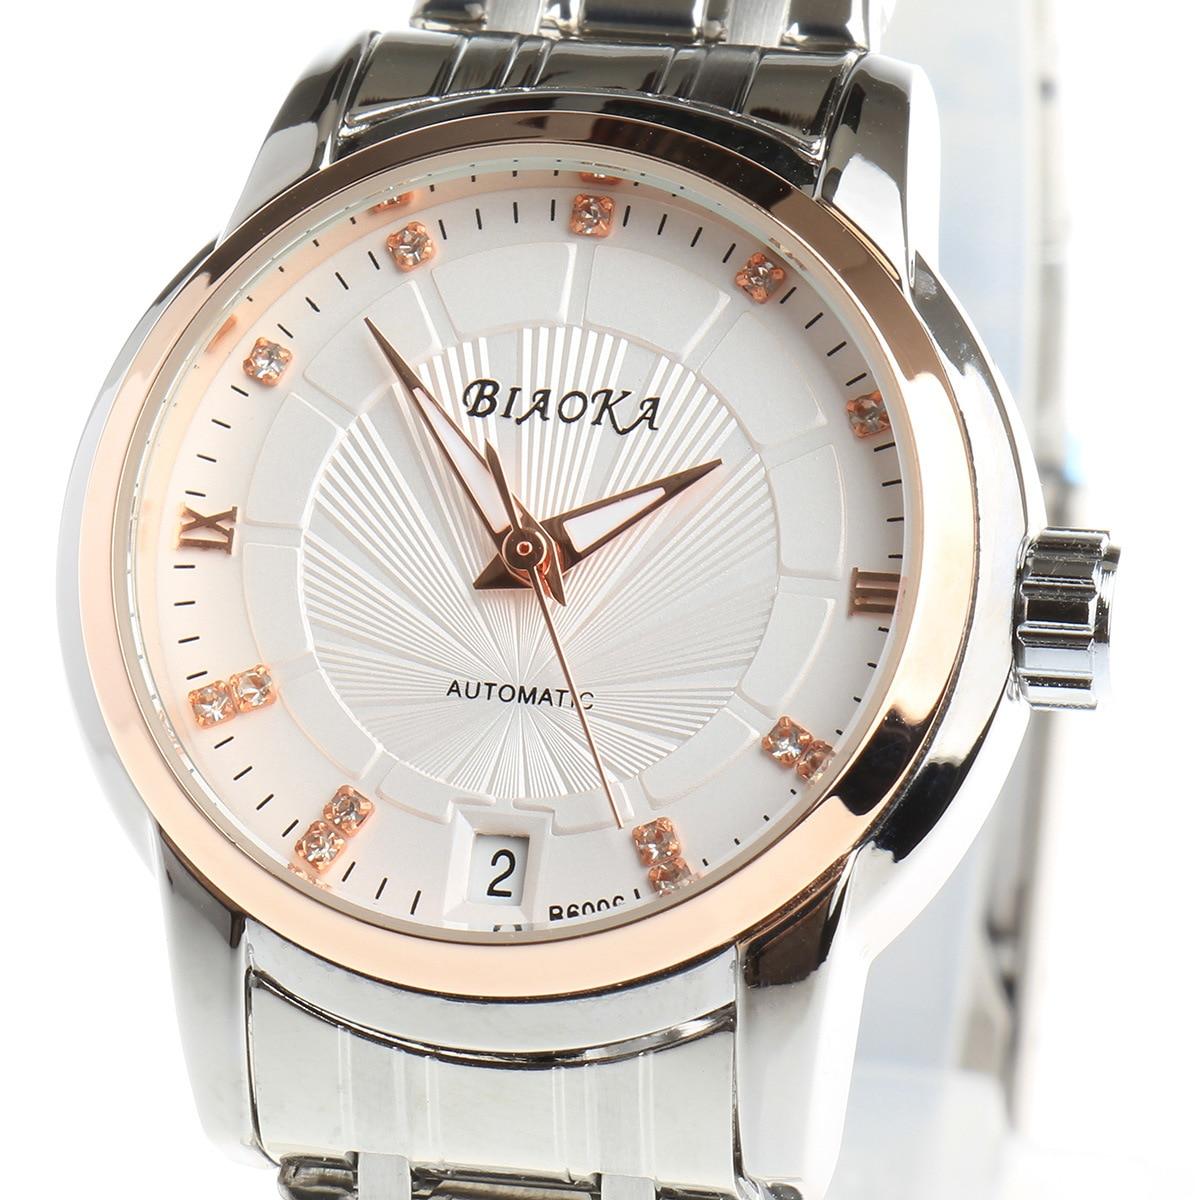 BIAOKA 브랜드 패션 로즈 골드 시계 여성 시계 클래식 기계 손목 Relogio Feminino 드레스 해골 방수 시계